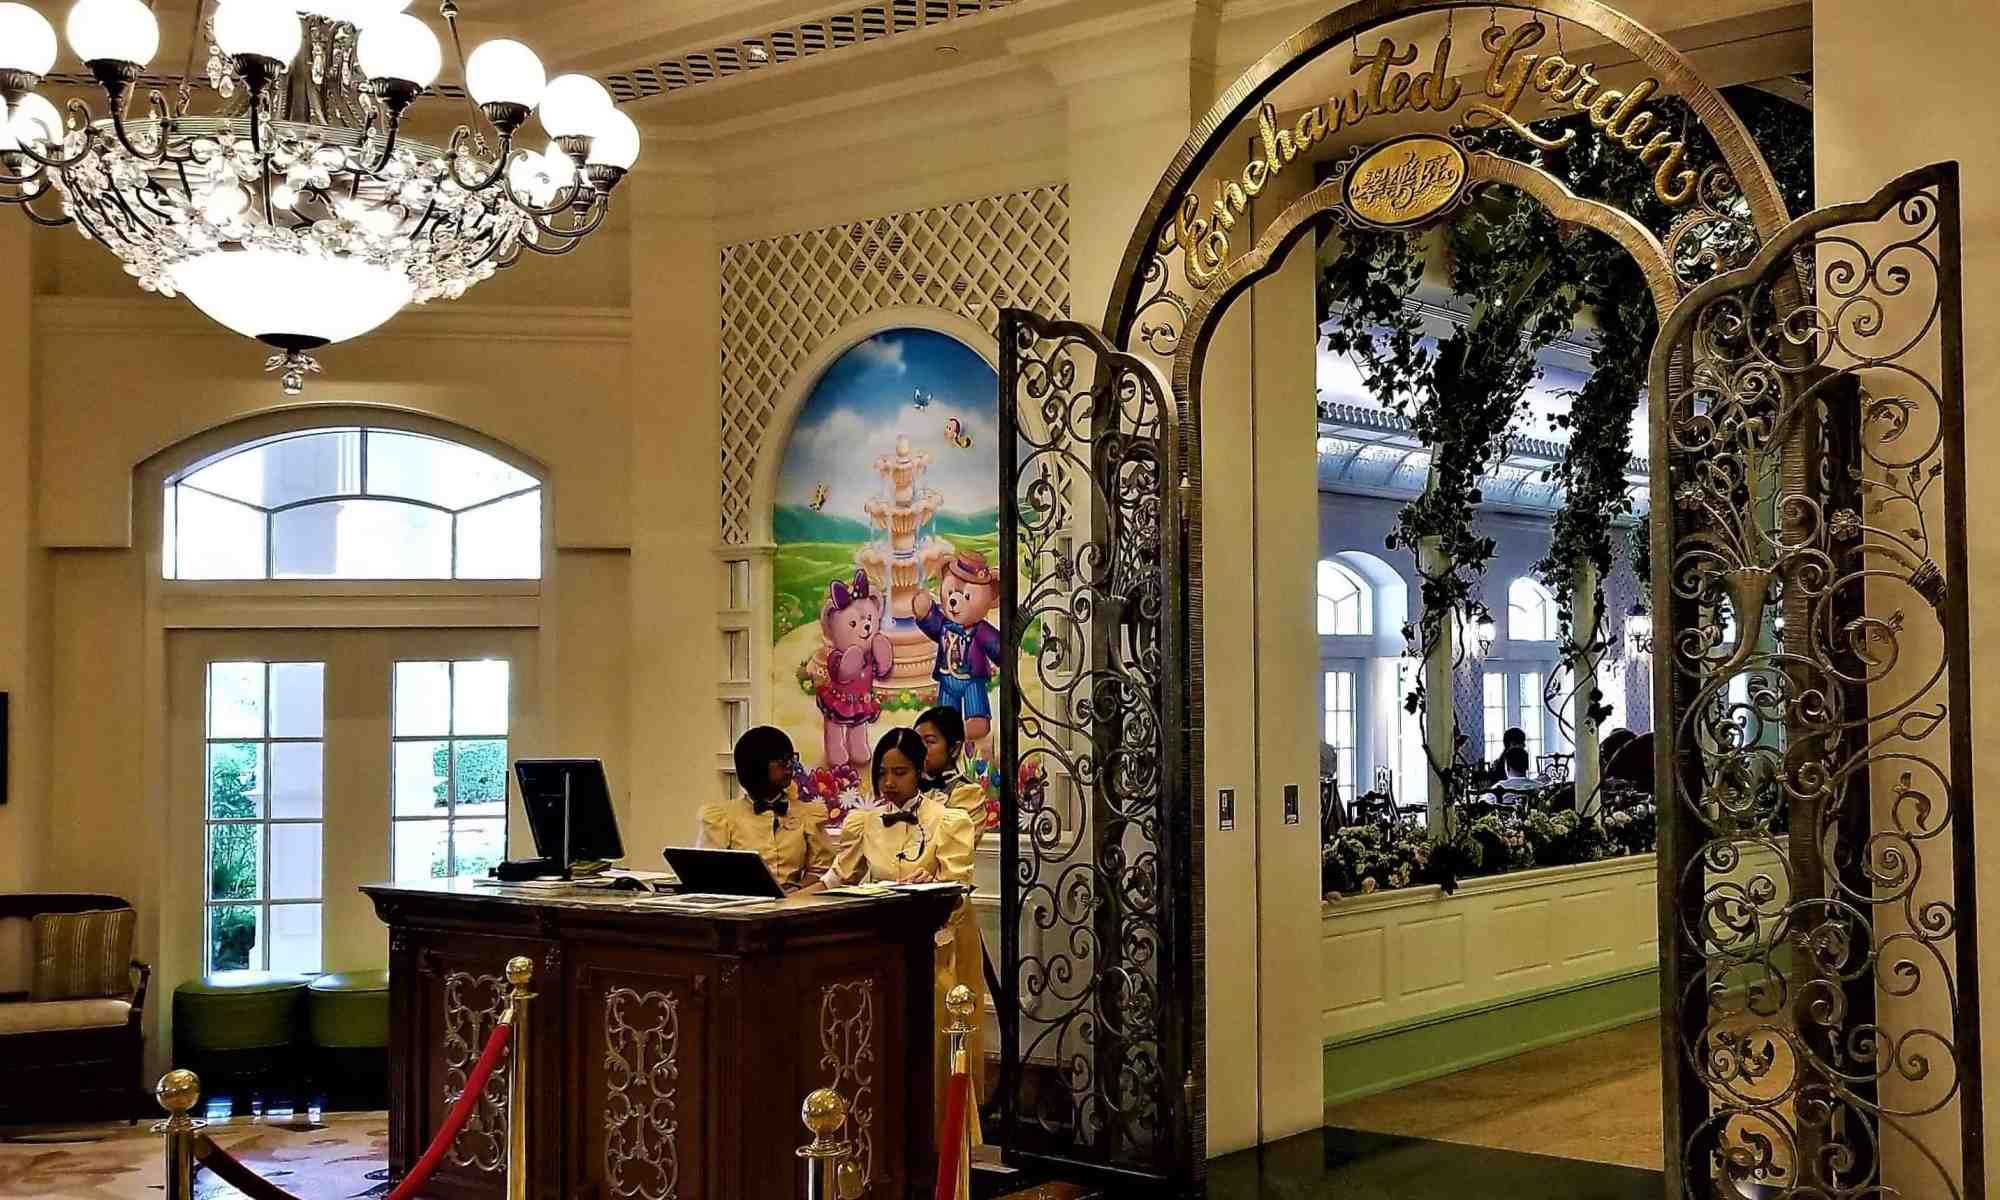 image-of-hong-kong-disneyland-hotel-enchanted-garden-entrance